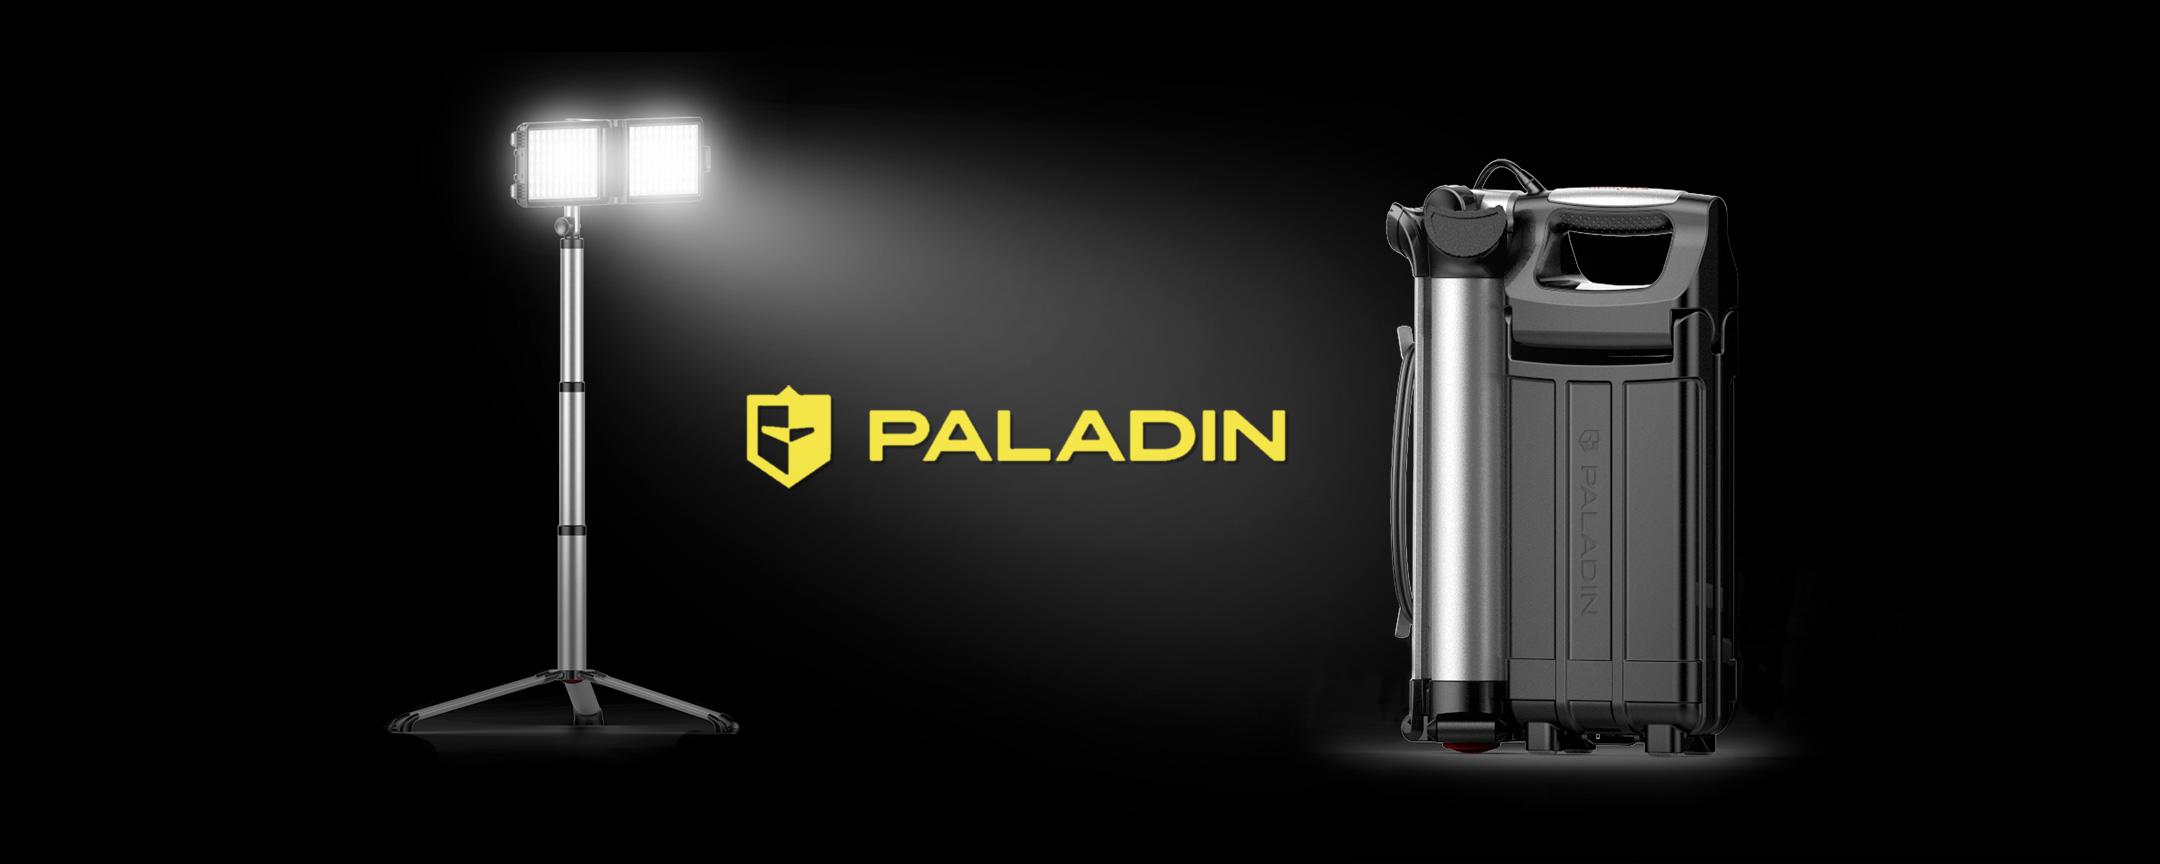 Paladin Work Light